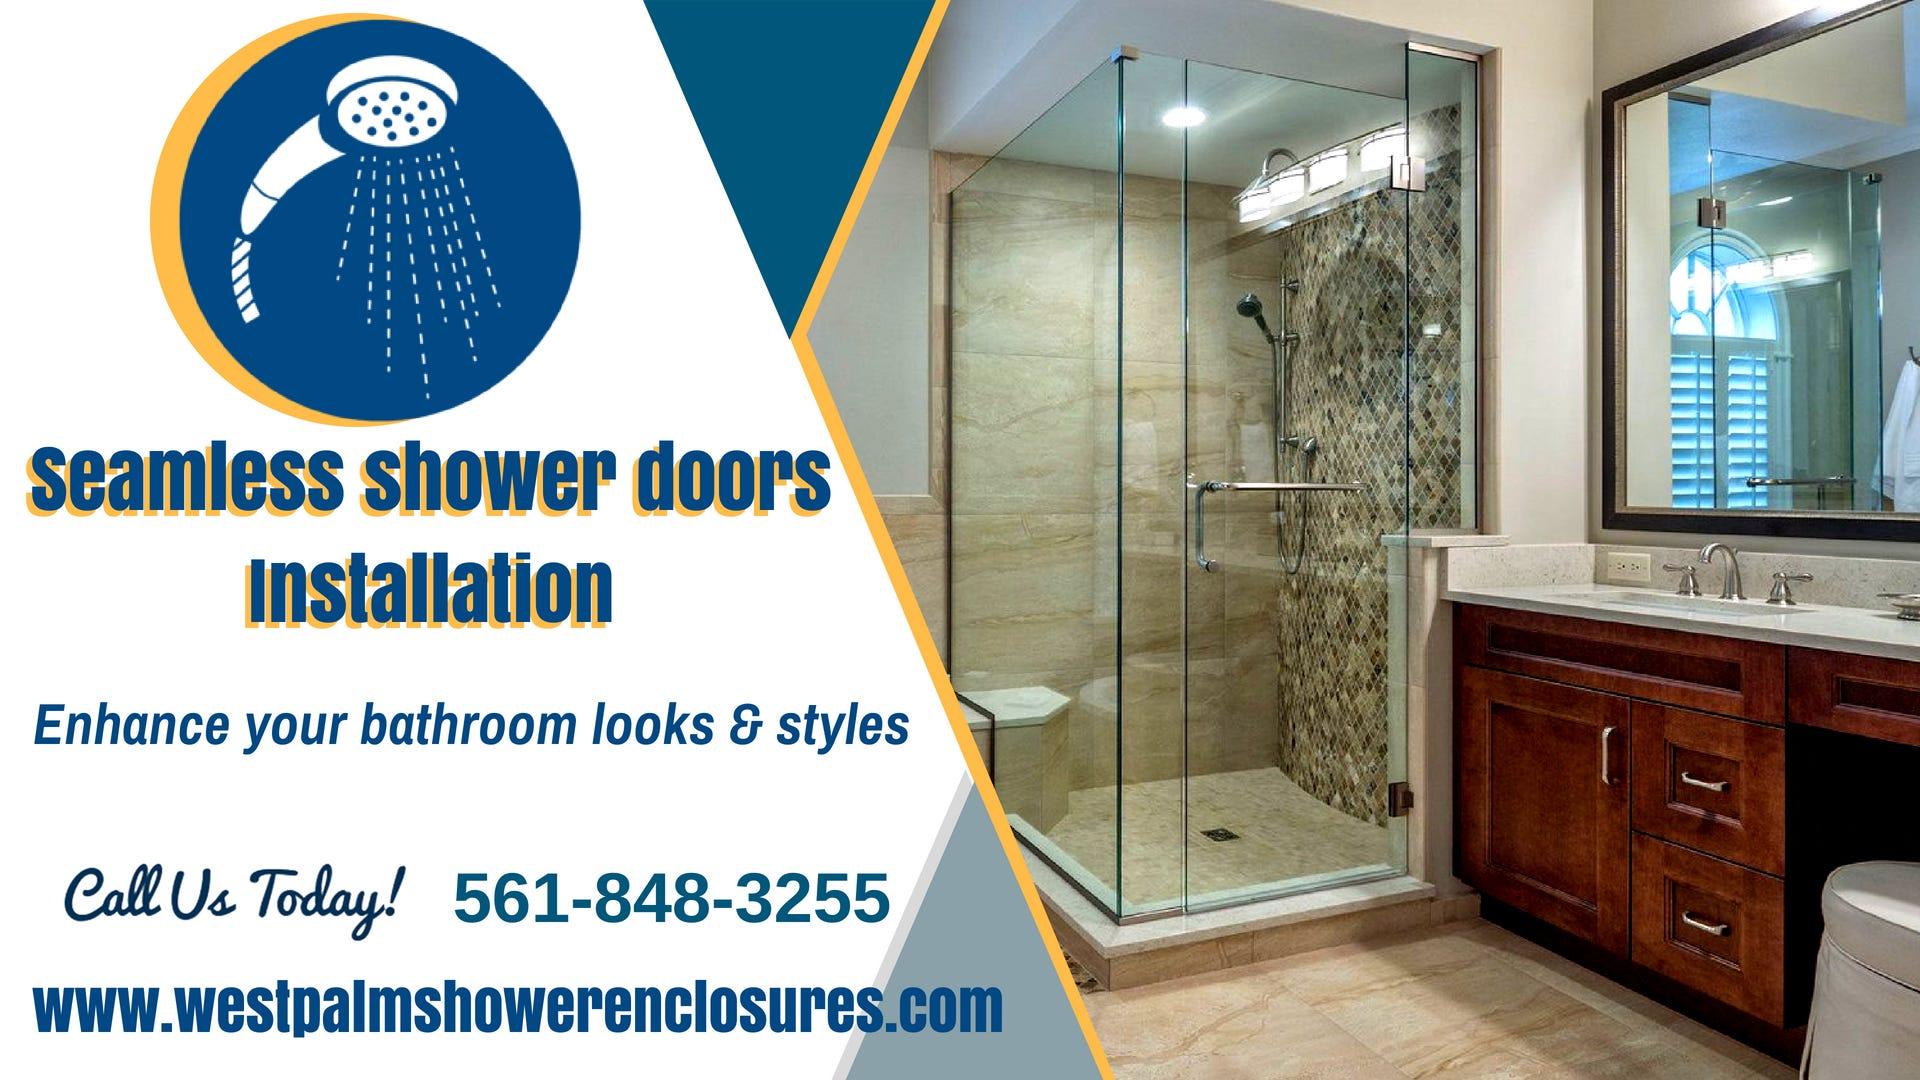 Seamless Shower Doors Installation Service West Palm